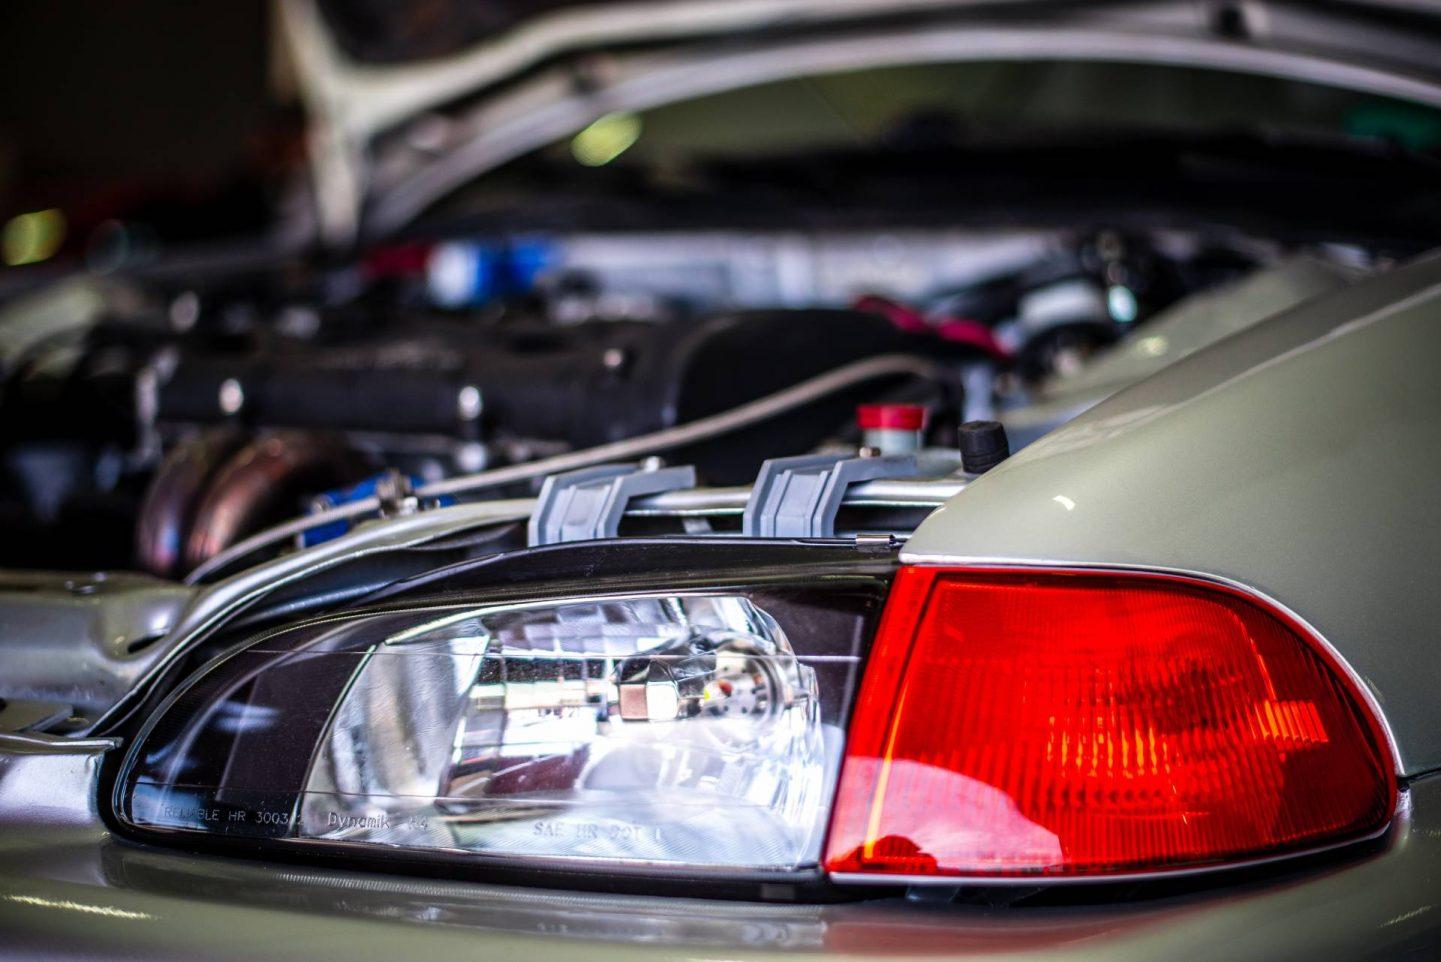 Essential Car Maintenance Tips For Winter, car headlamp